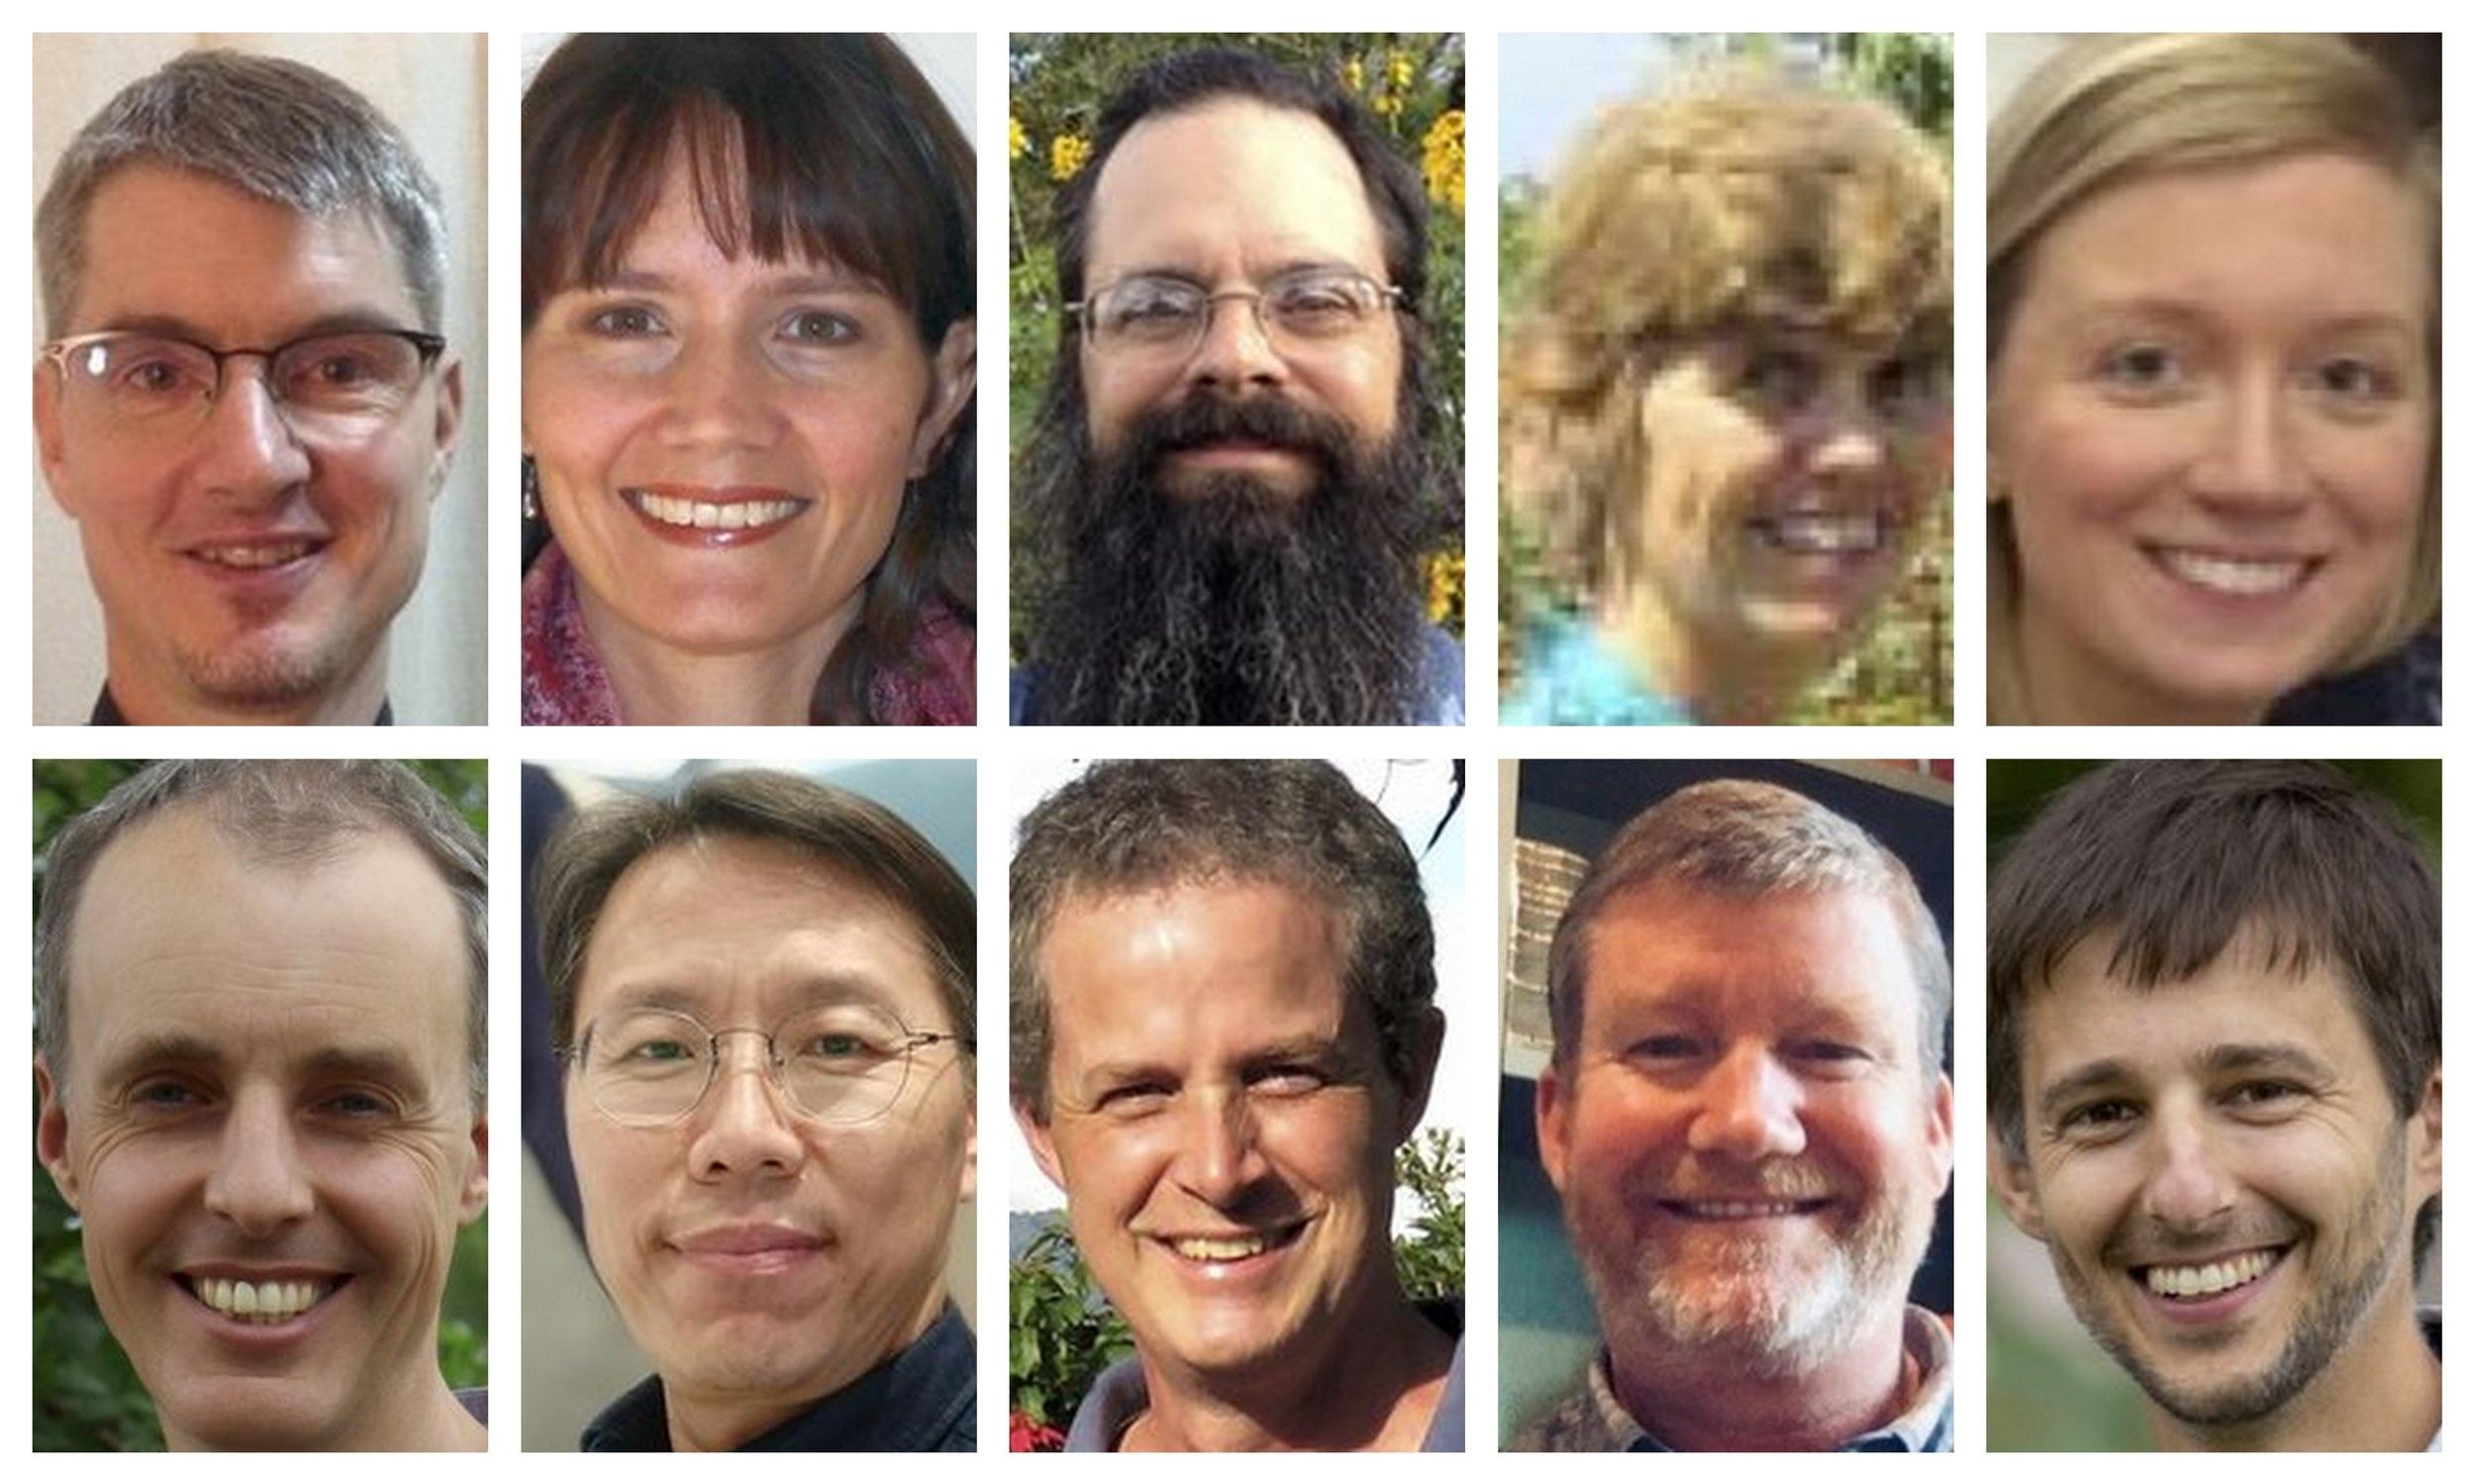 Top: Anderbeck, Beavon-Ham, Crosland, Dickie, Hanna. Bottom: Harley, Son, Troolin, Watters, Yoder.